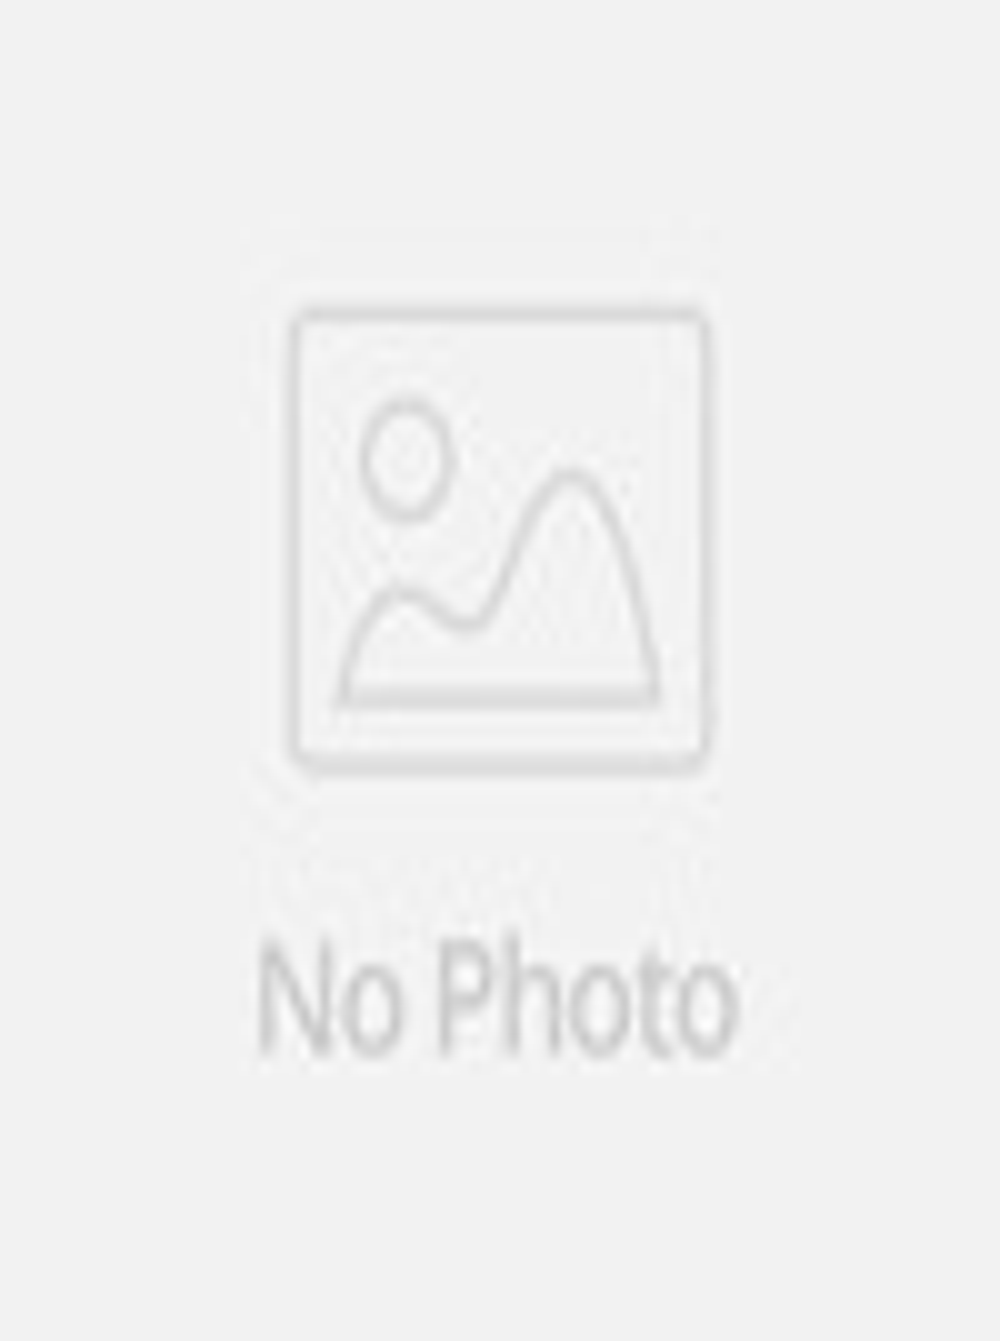 Inflatable Yard Decorations Christmas – Decoration Image Idea